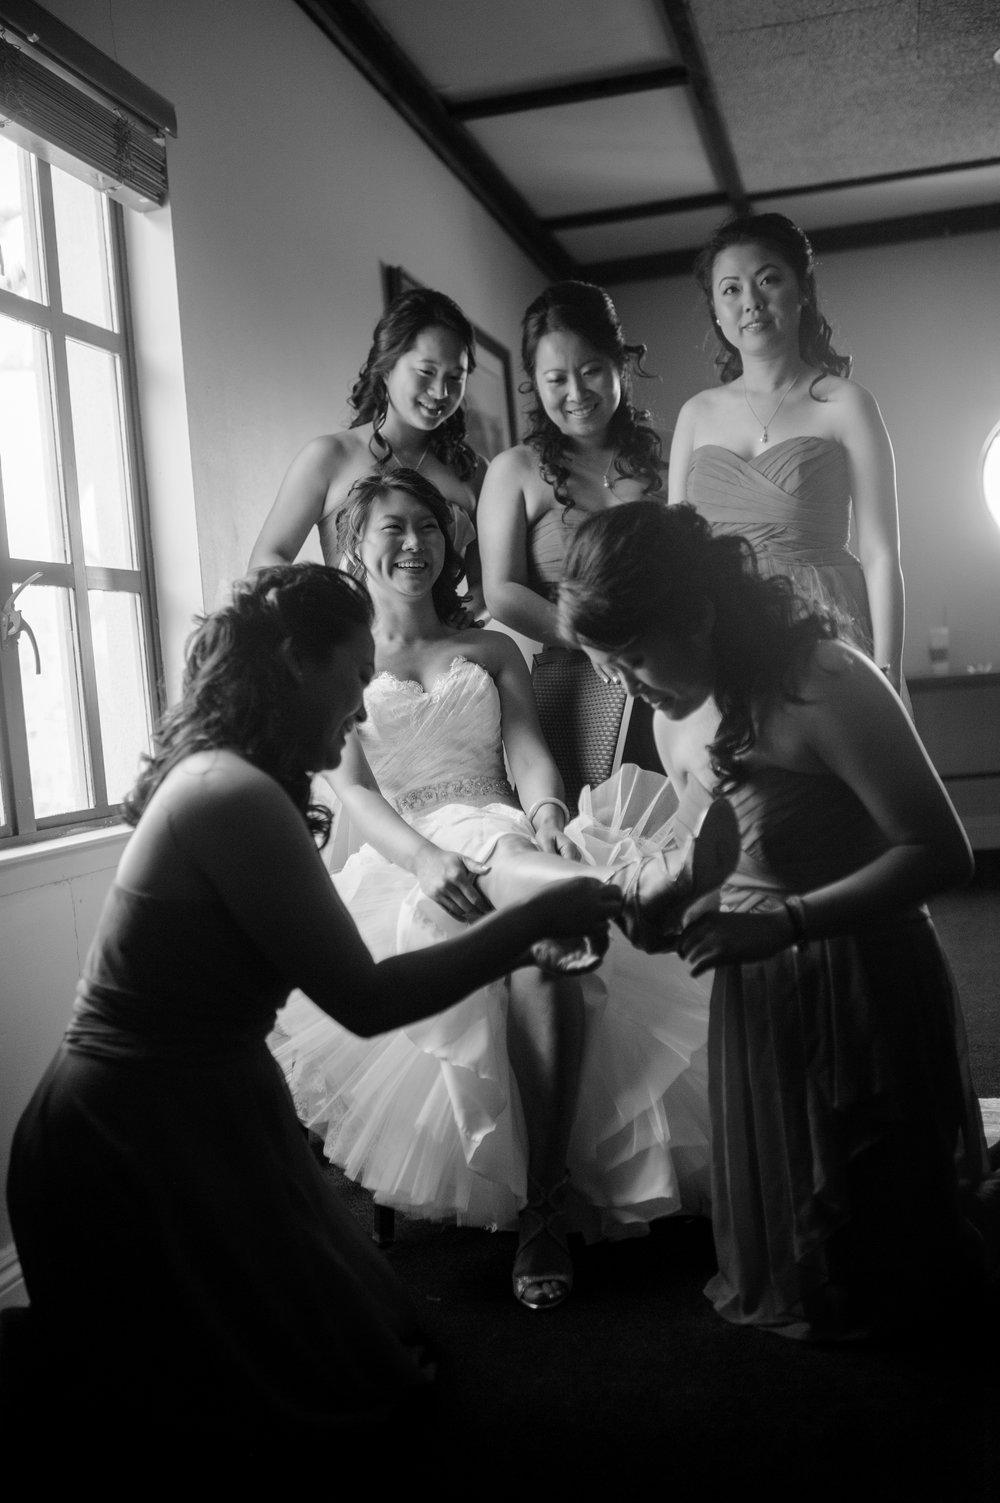 qui-david-009-wente-vineyards-livermore-wedding-photographer-katherine-nicole-photography.JPG